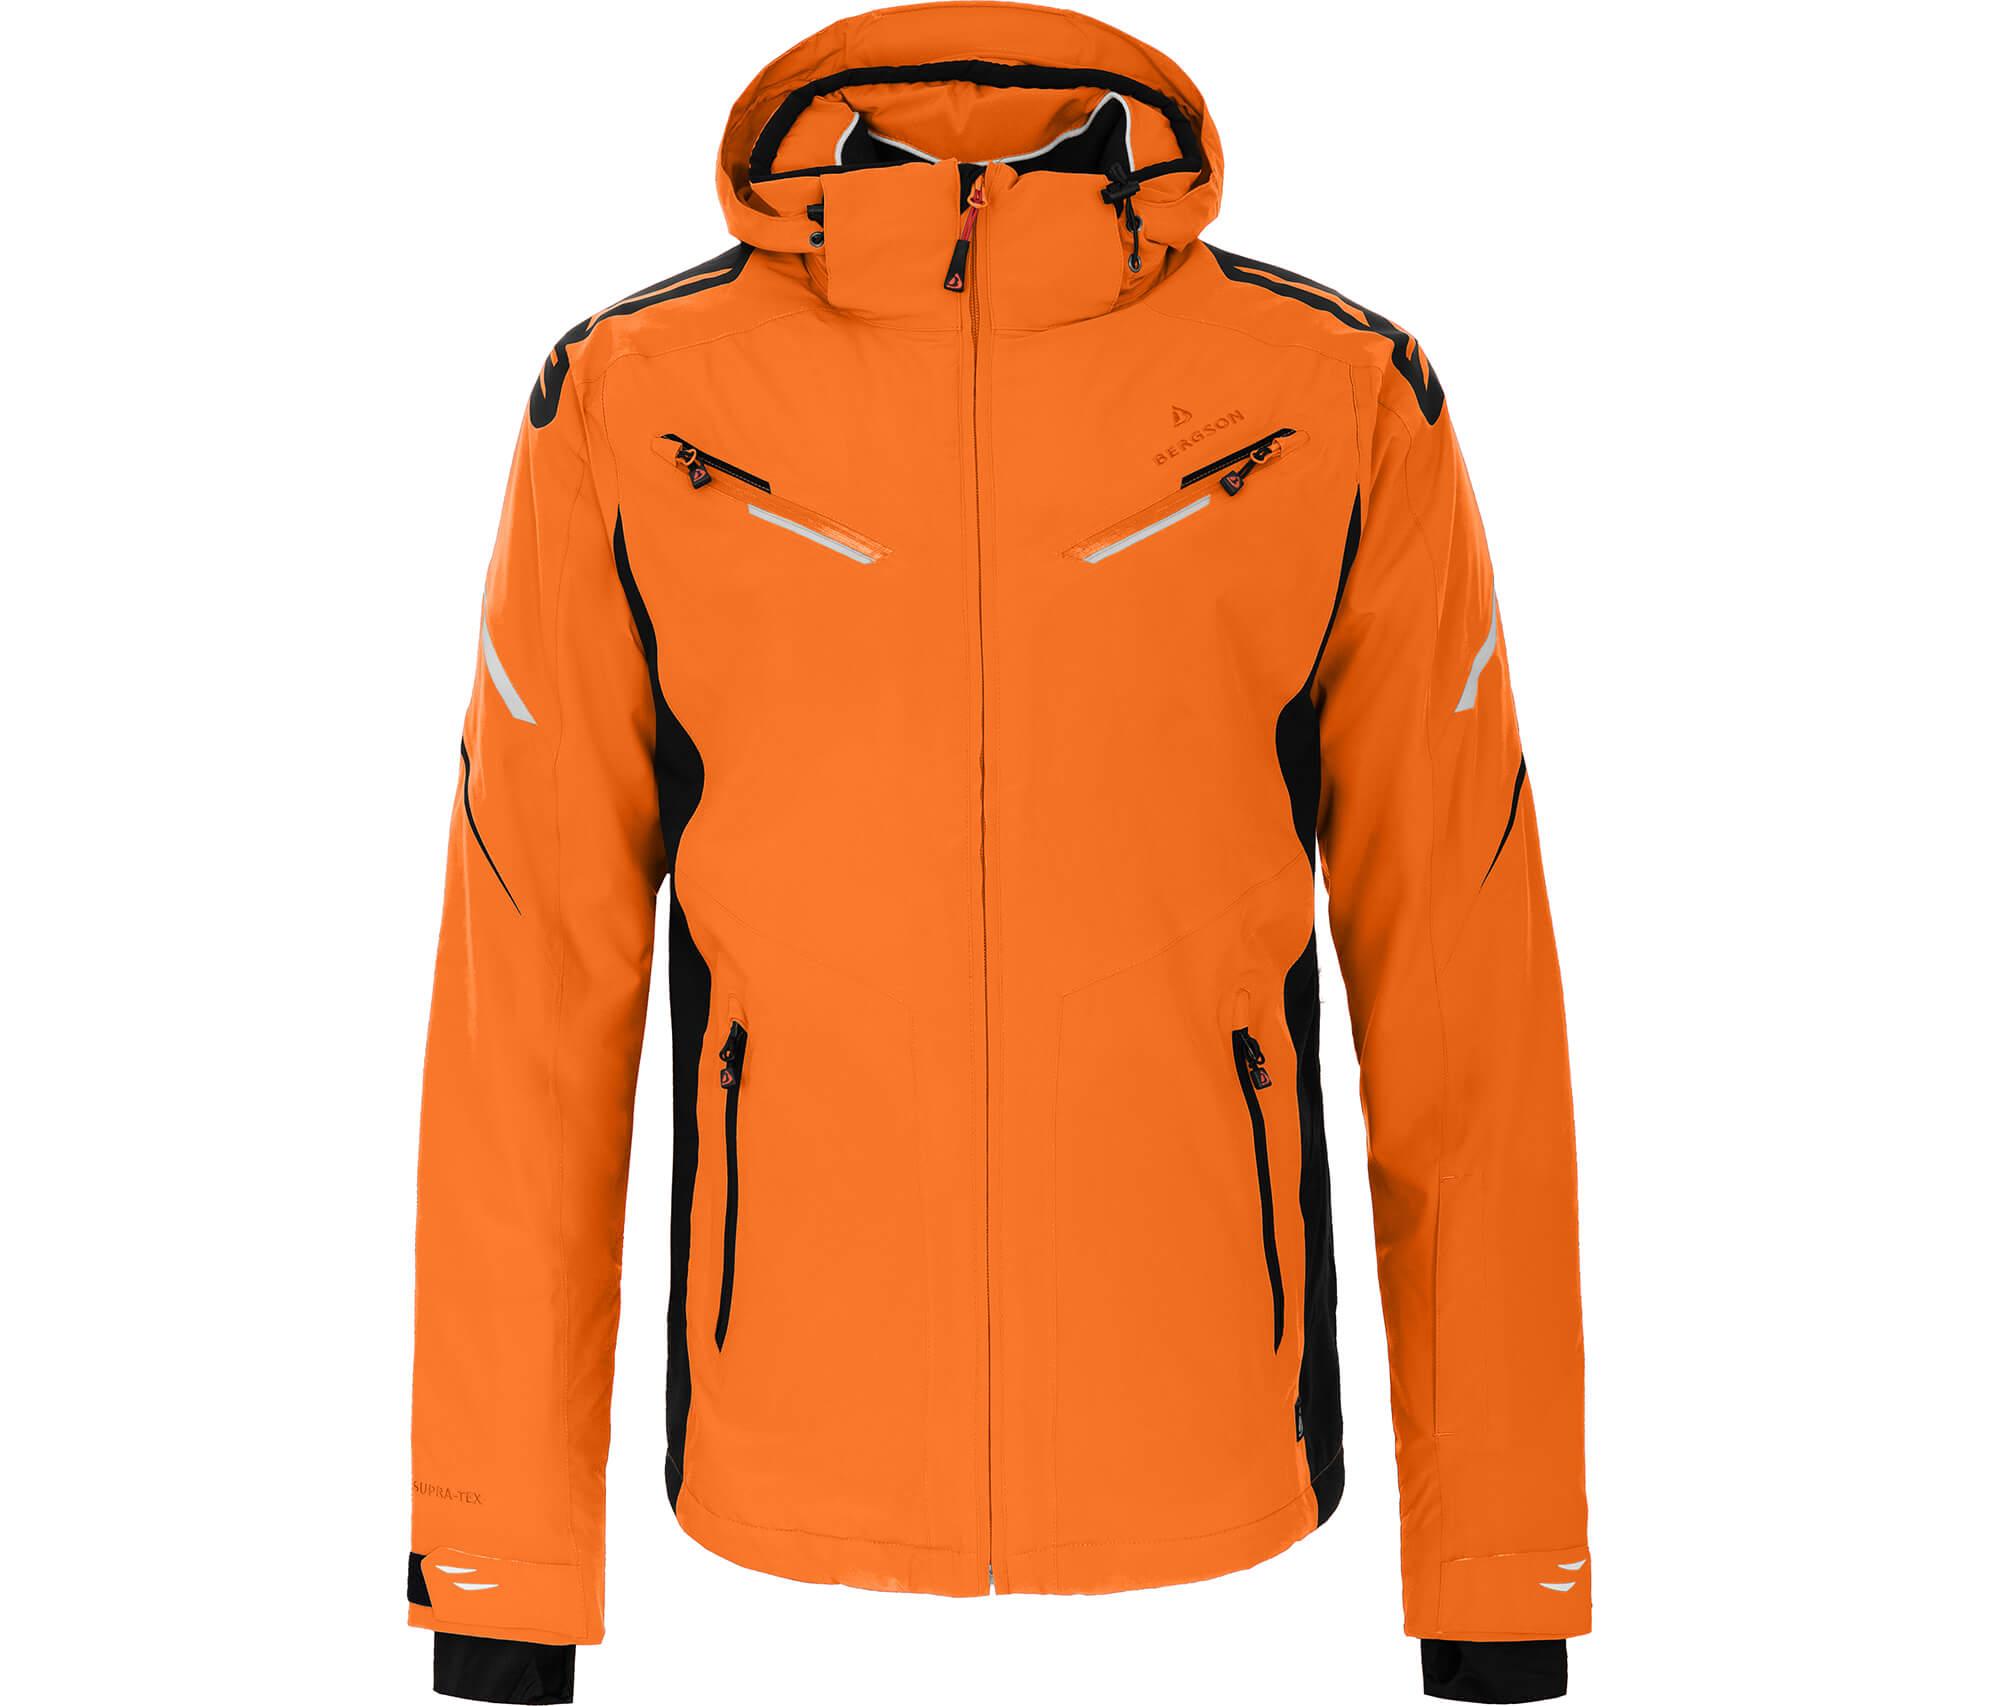 Bergson Herren Skijacke DISTRICT orange